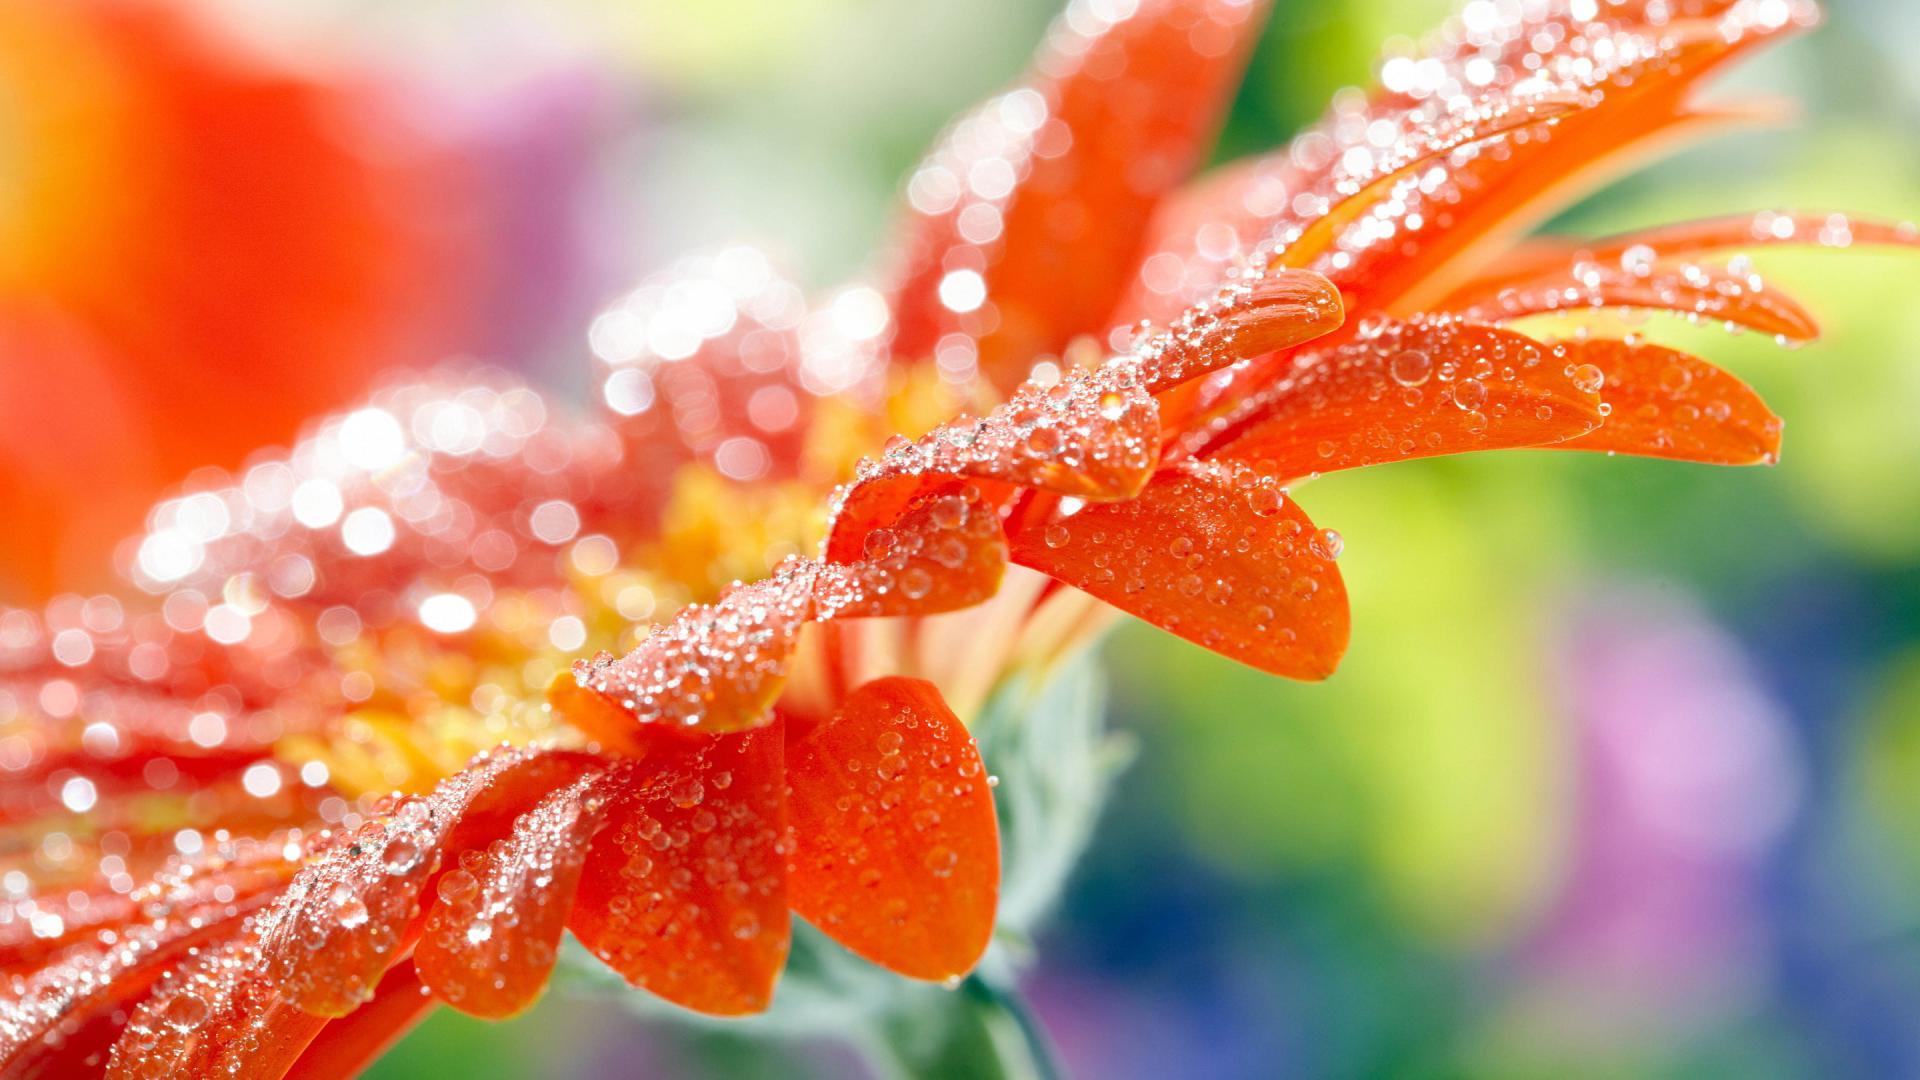 8 80883 beautiful wallpapers of nature for desktop free download